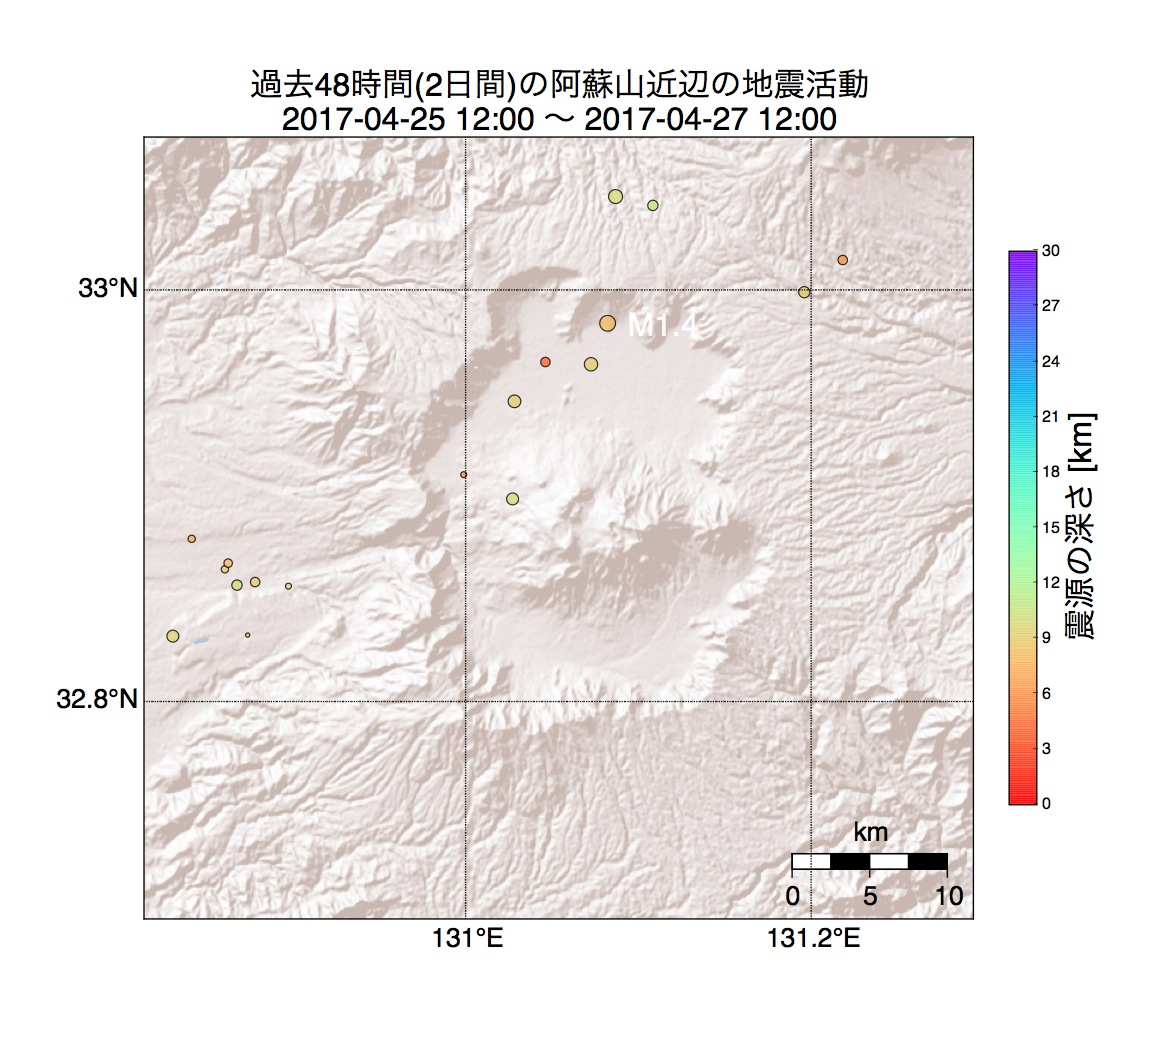 http://jishin.chamu.org/aso/20170427_1.jpg